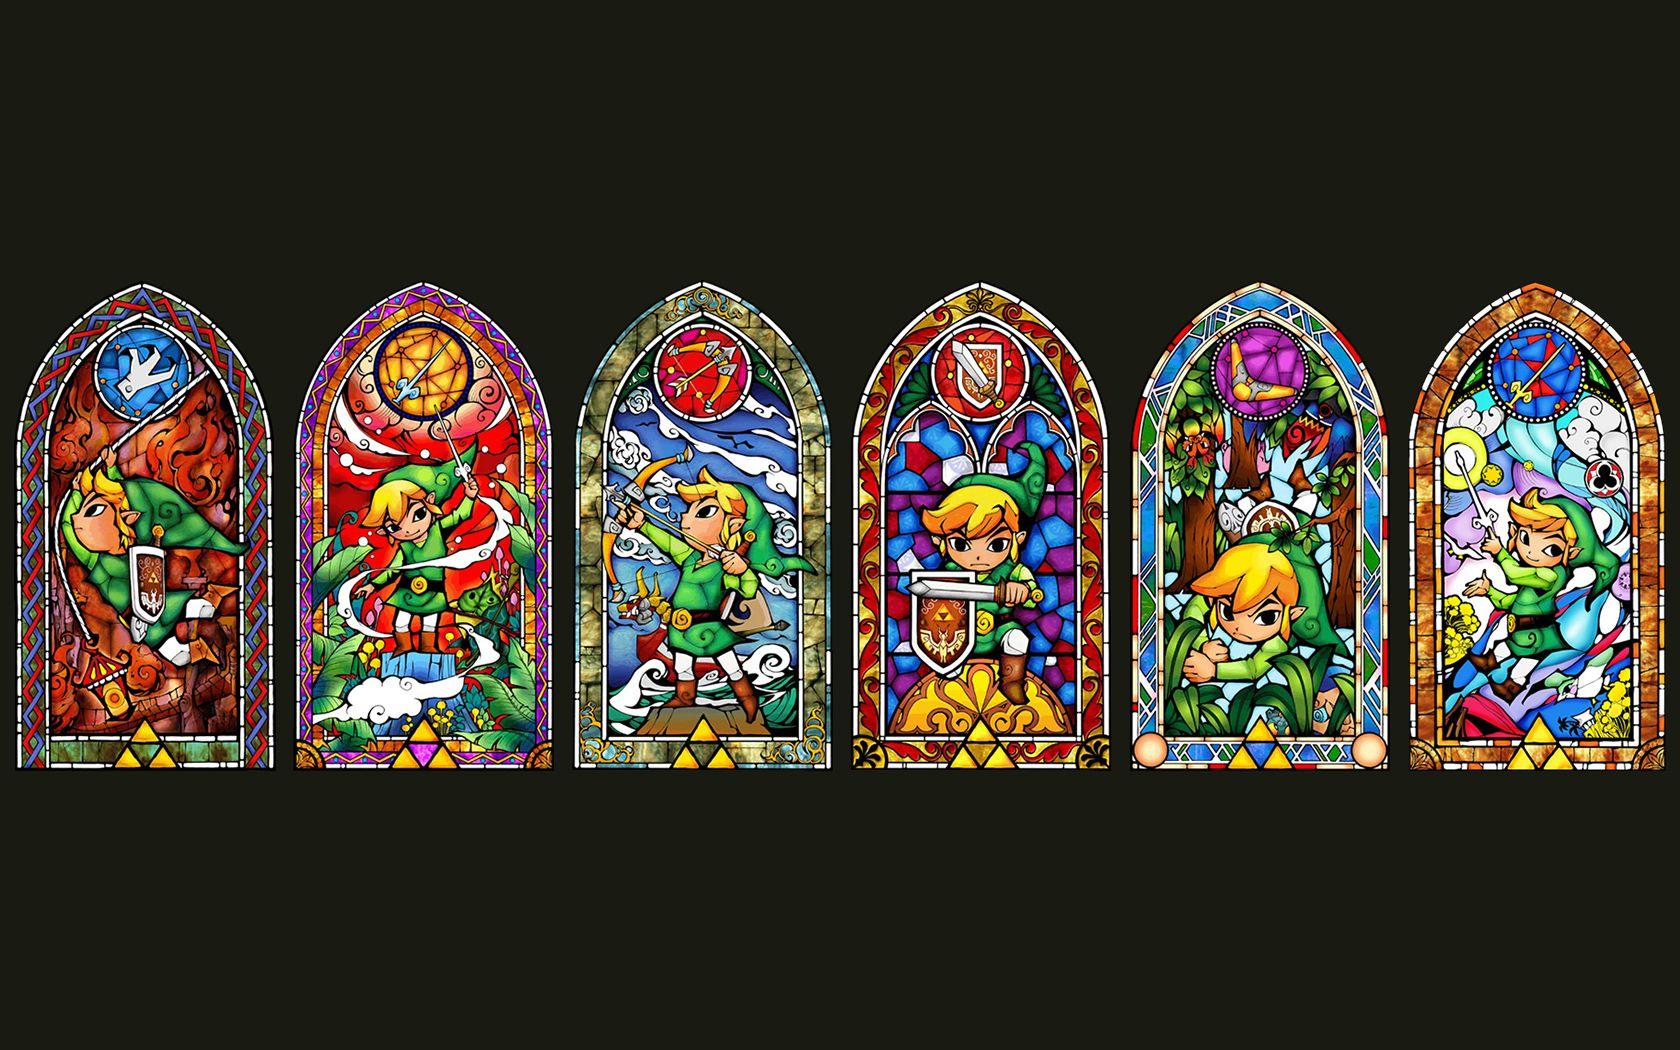 Zelda Wallpaper 1680×1050 929 Kb Quality HD